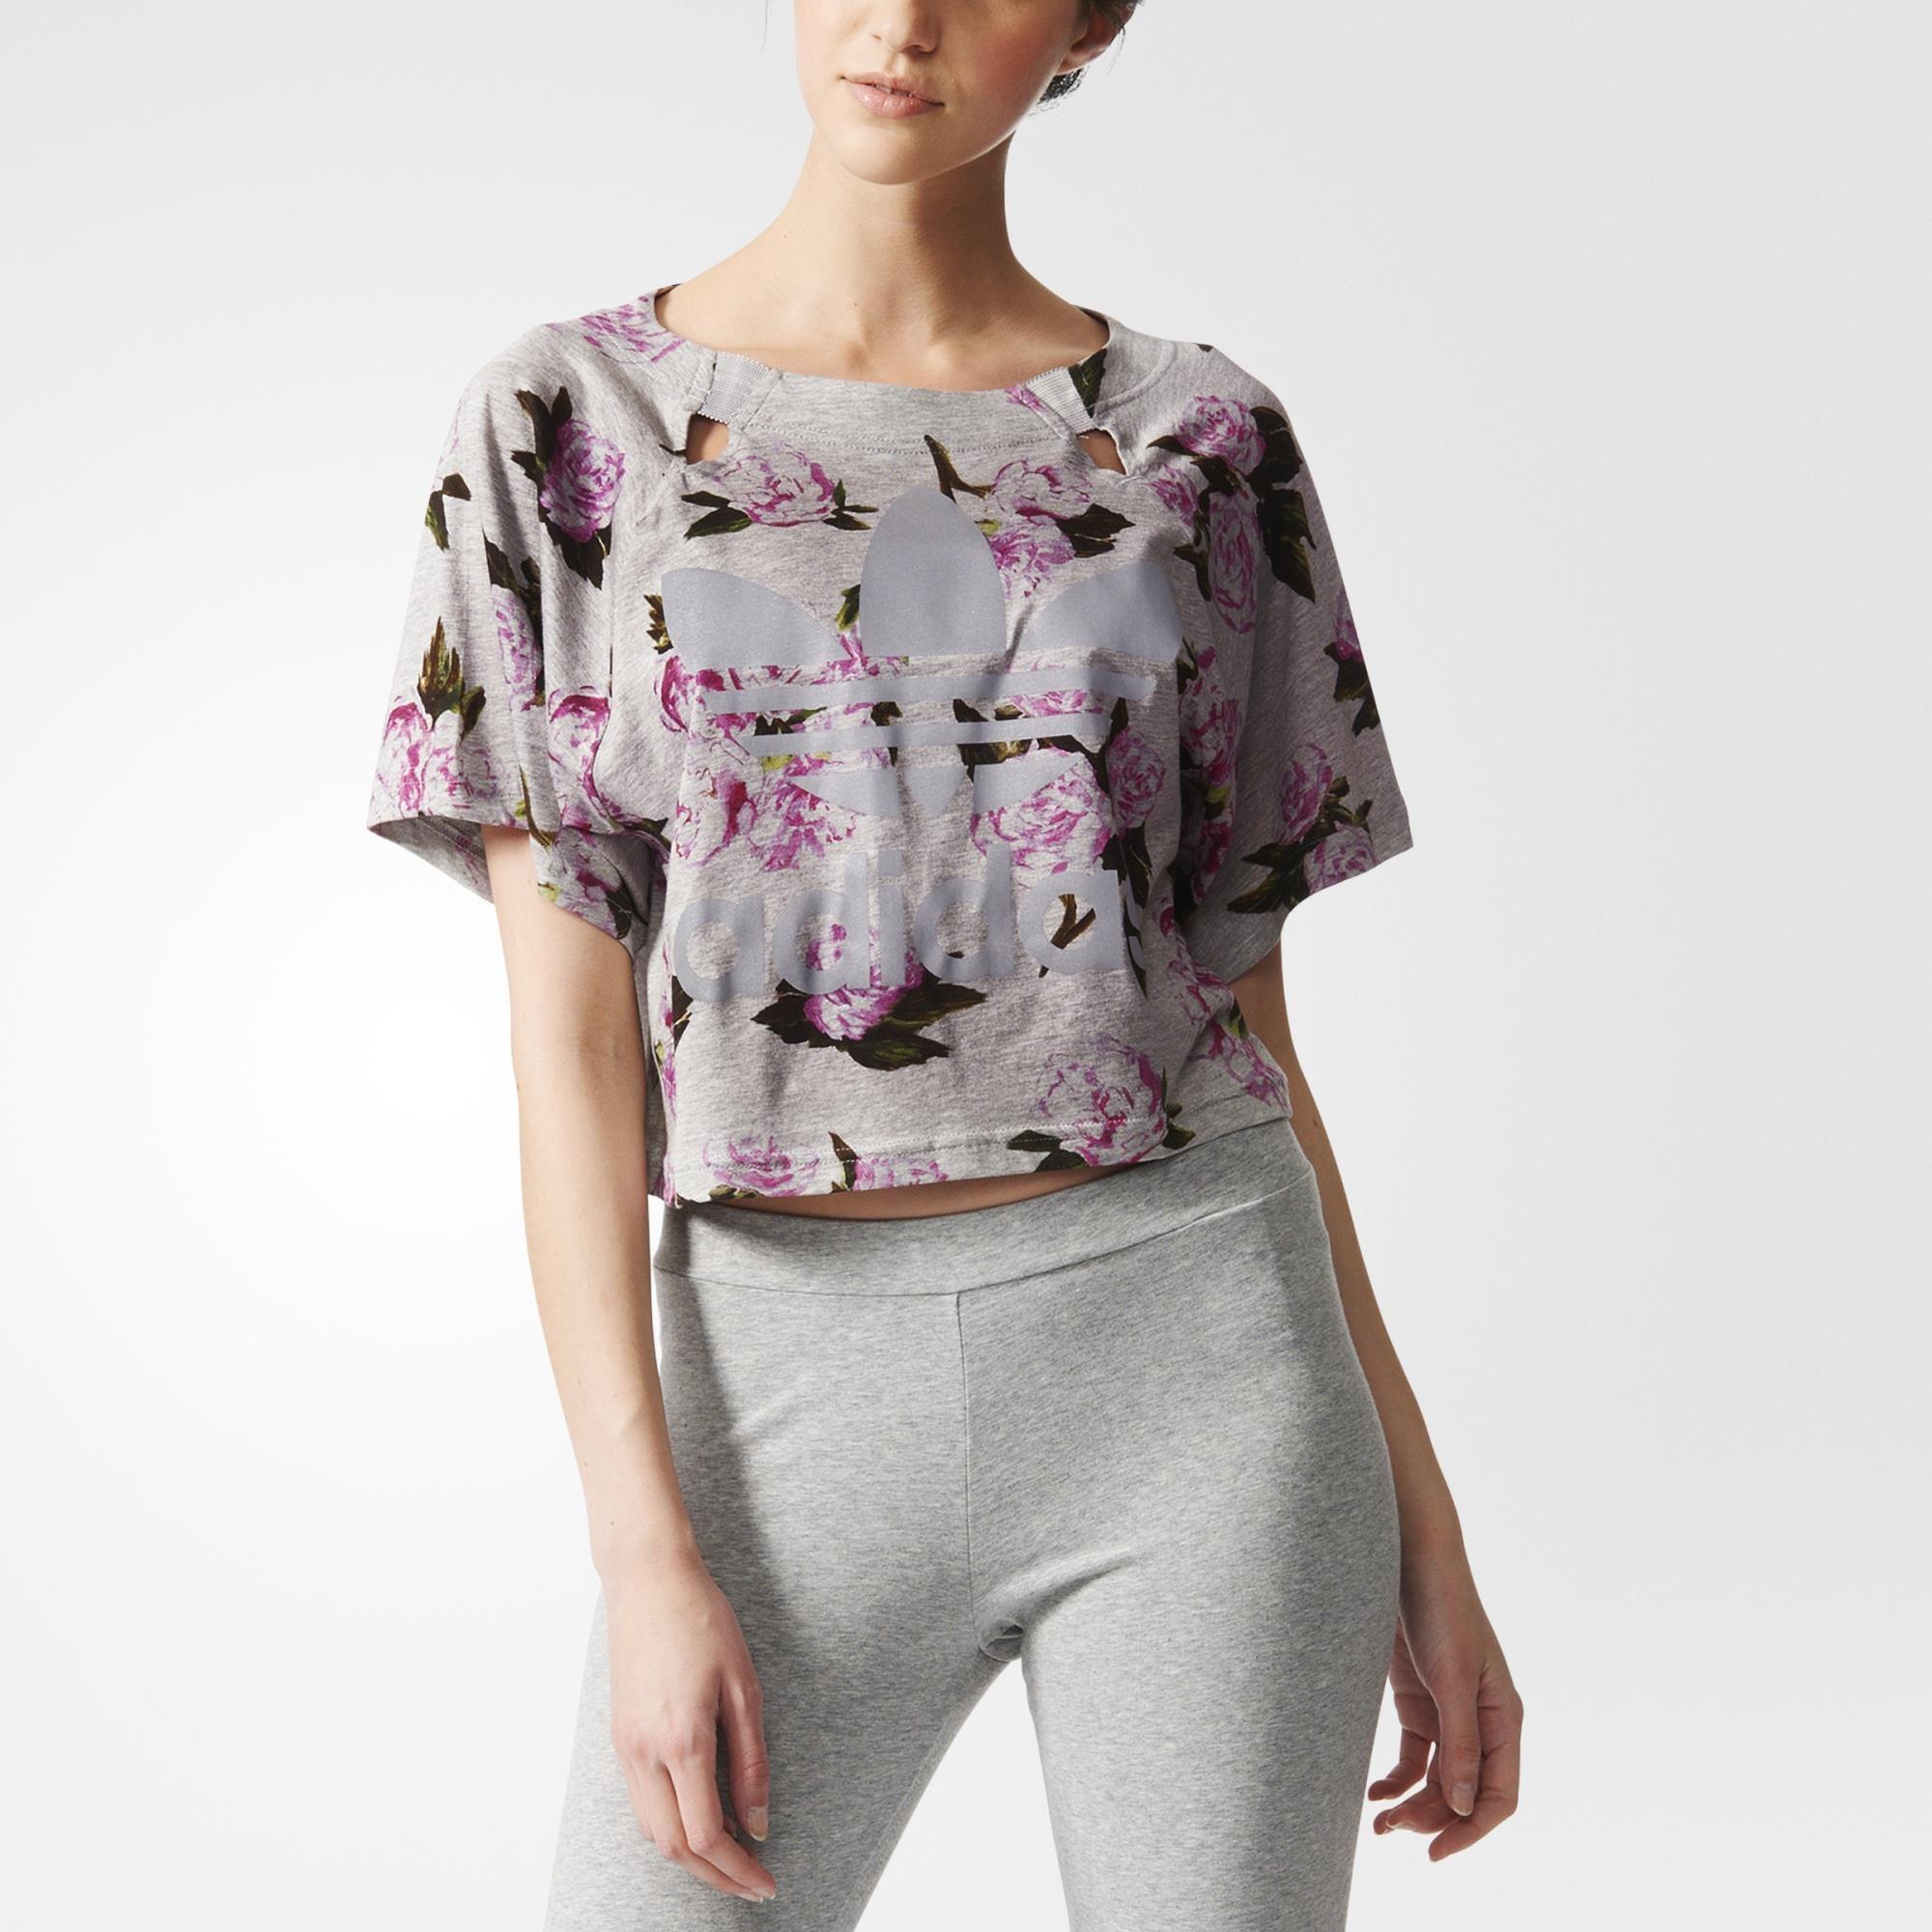 33ad7199c4c989 adidas Women s Jeremy Scott Floral Crop Top - Grey